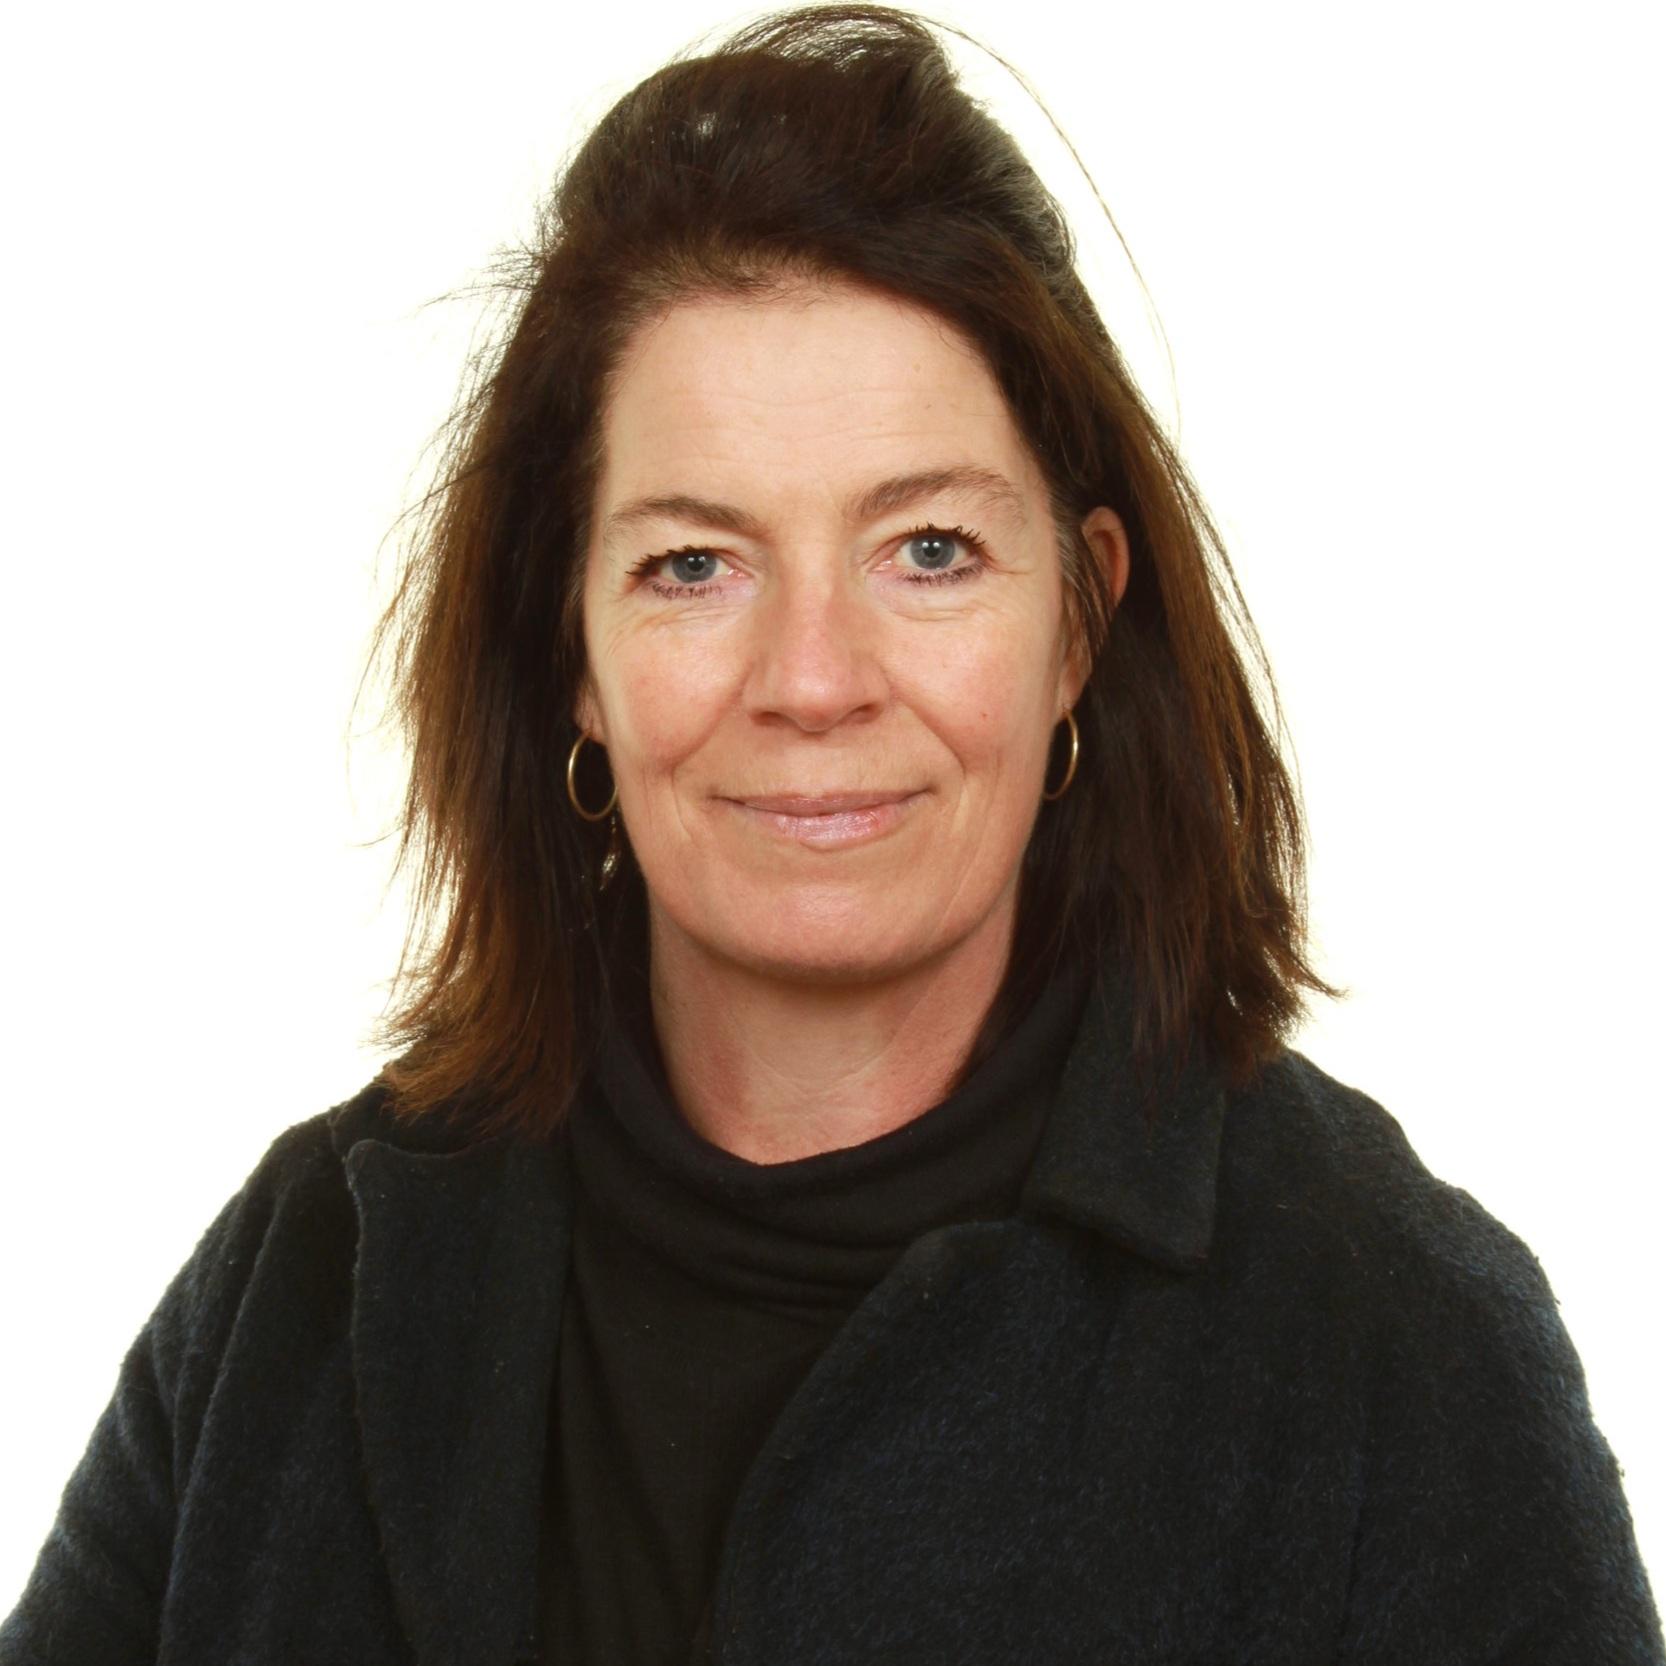 Practitioner - Laura Richmond (Cache level 3)